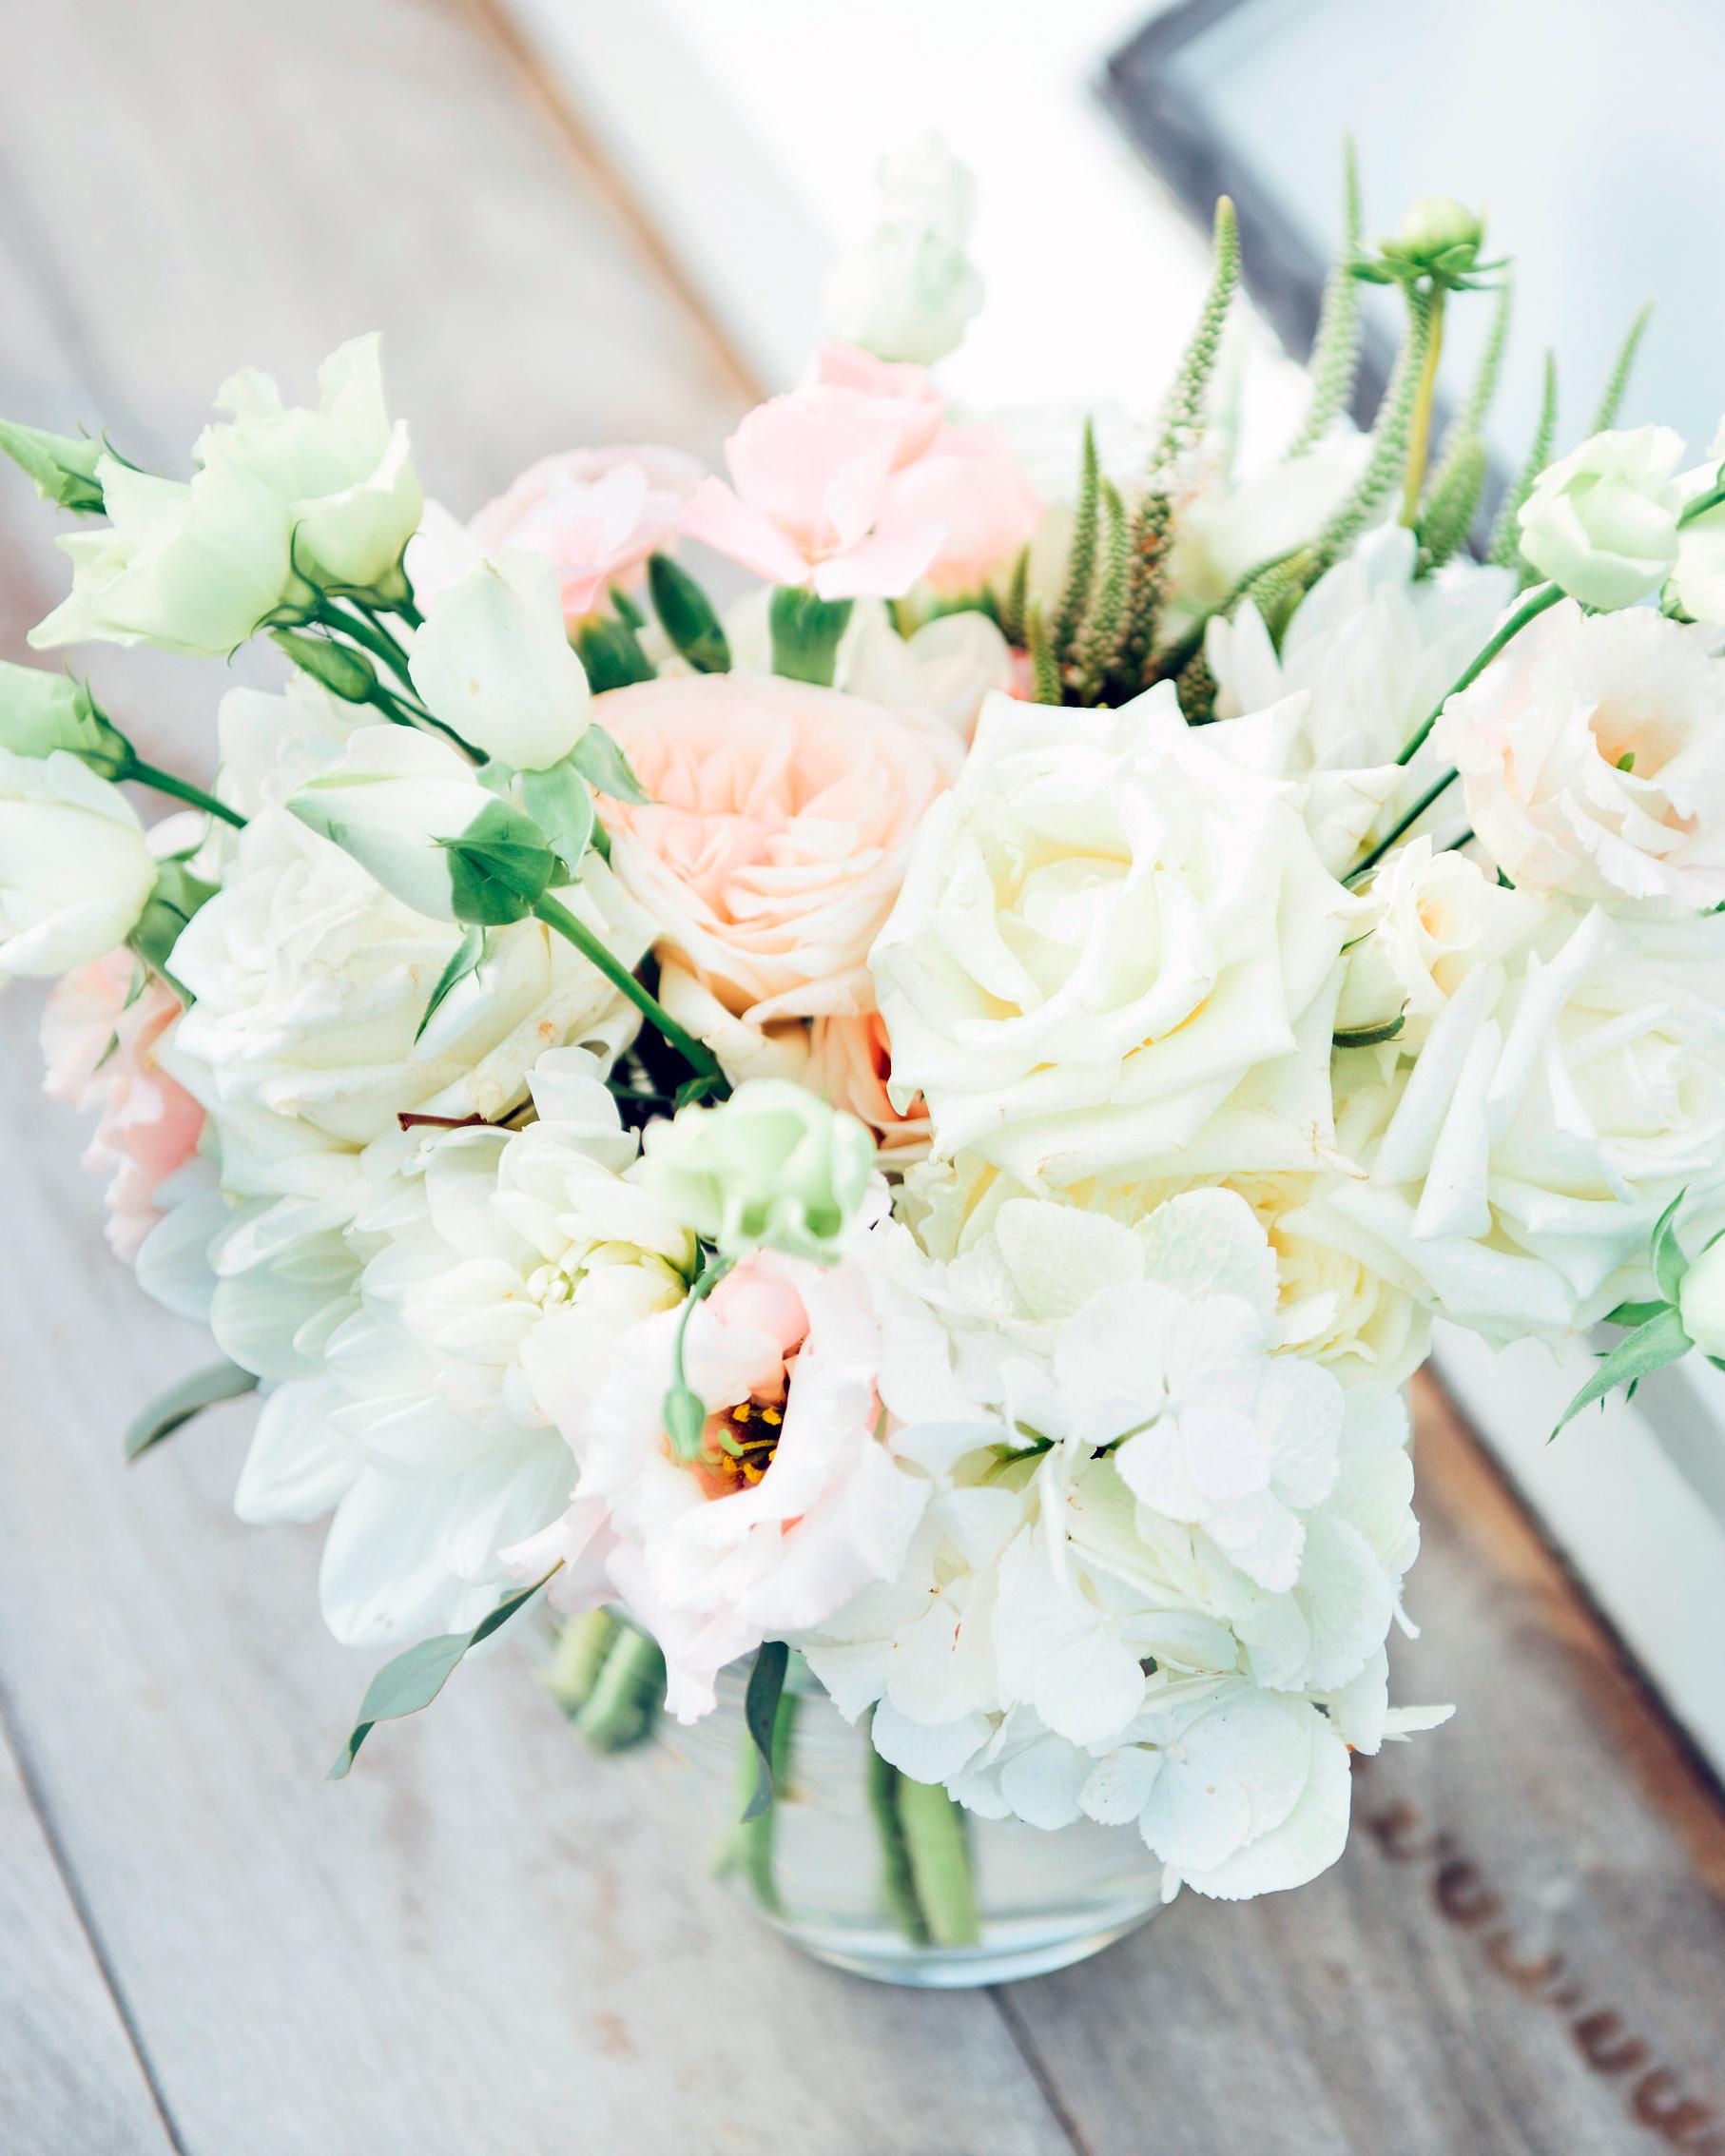 jenny-freddie-boatride-flowers-017-s112779-1215.jpg